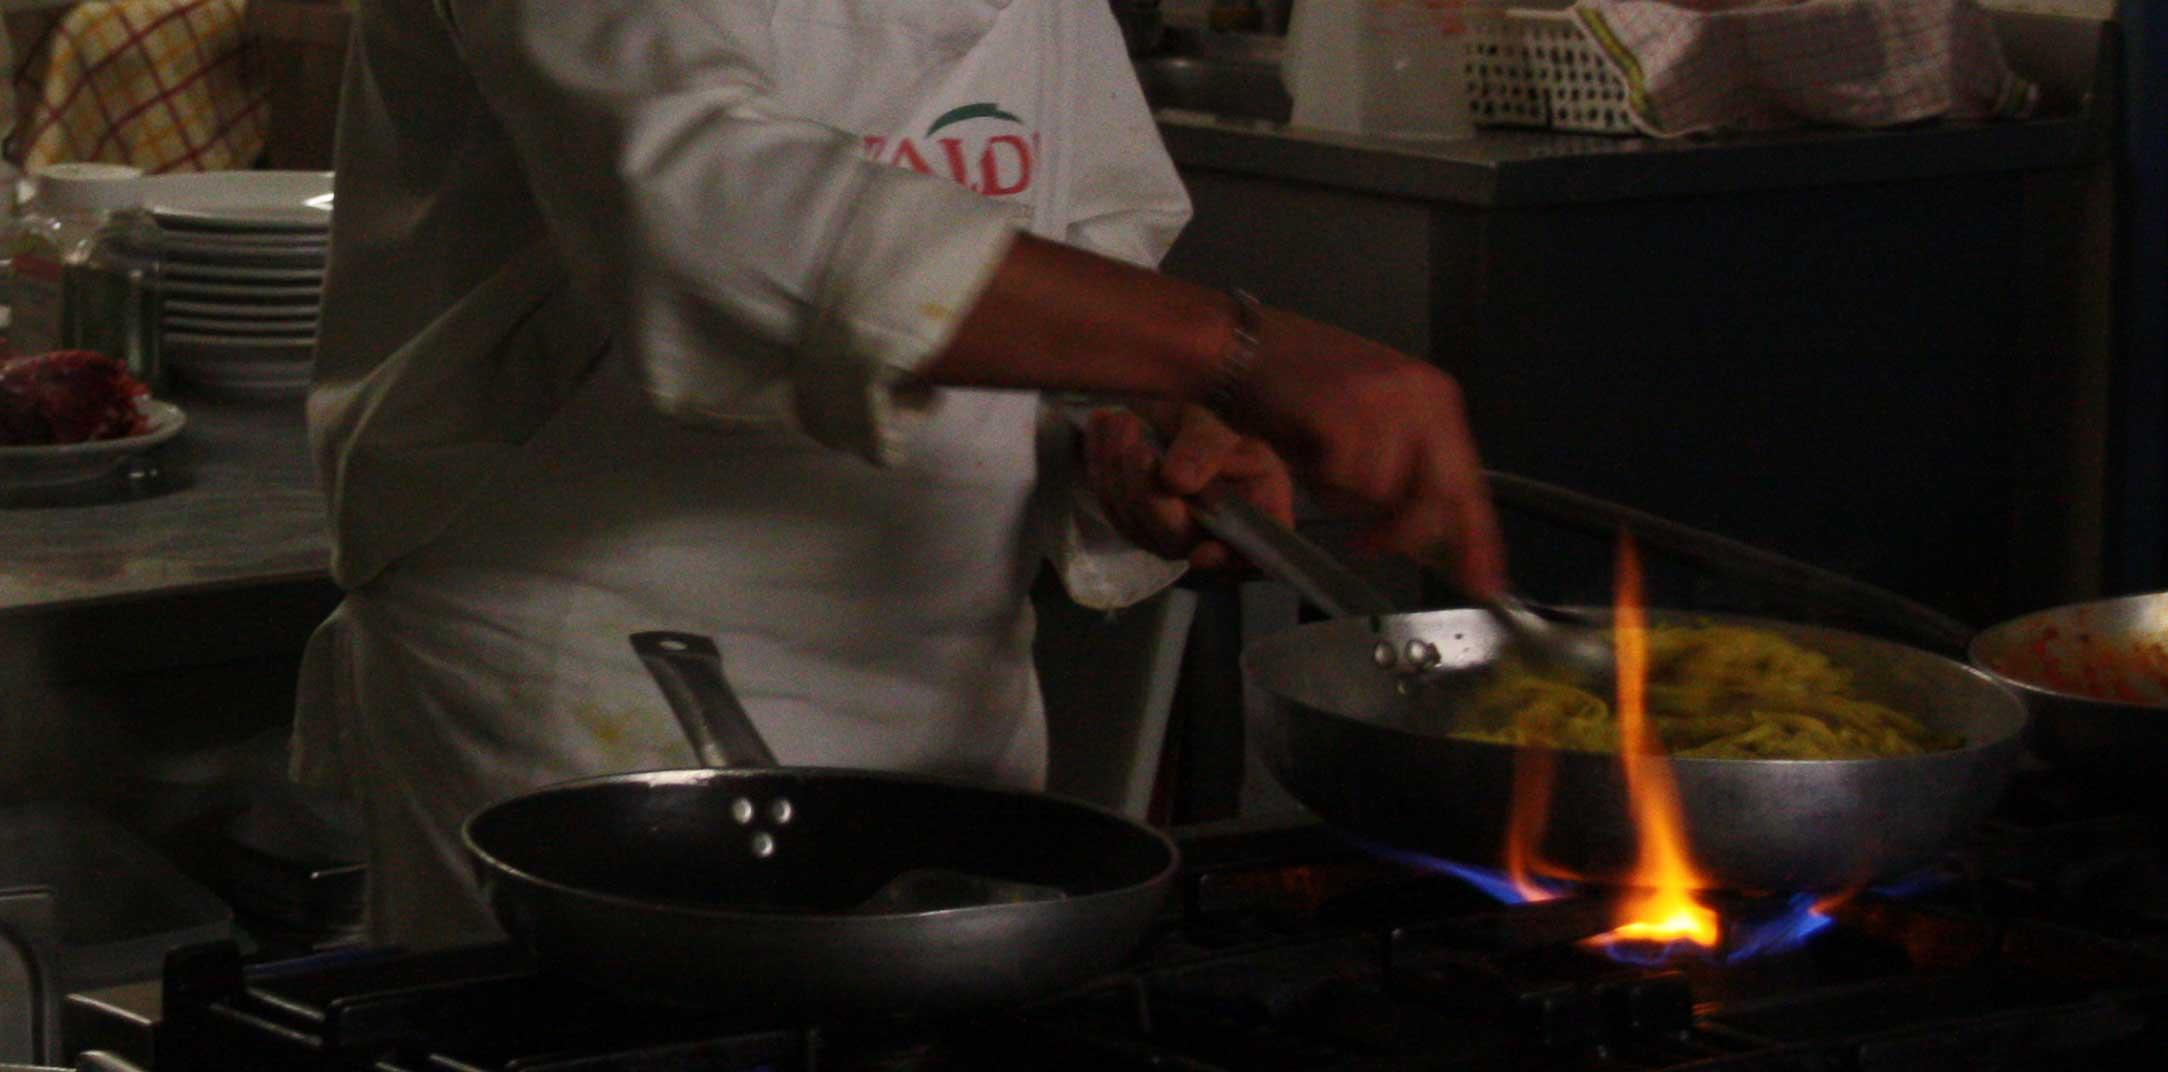 La cucina dal Navigante